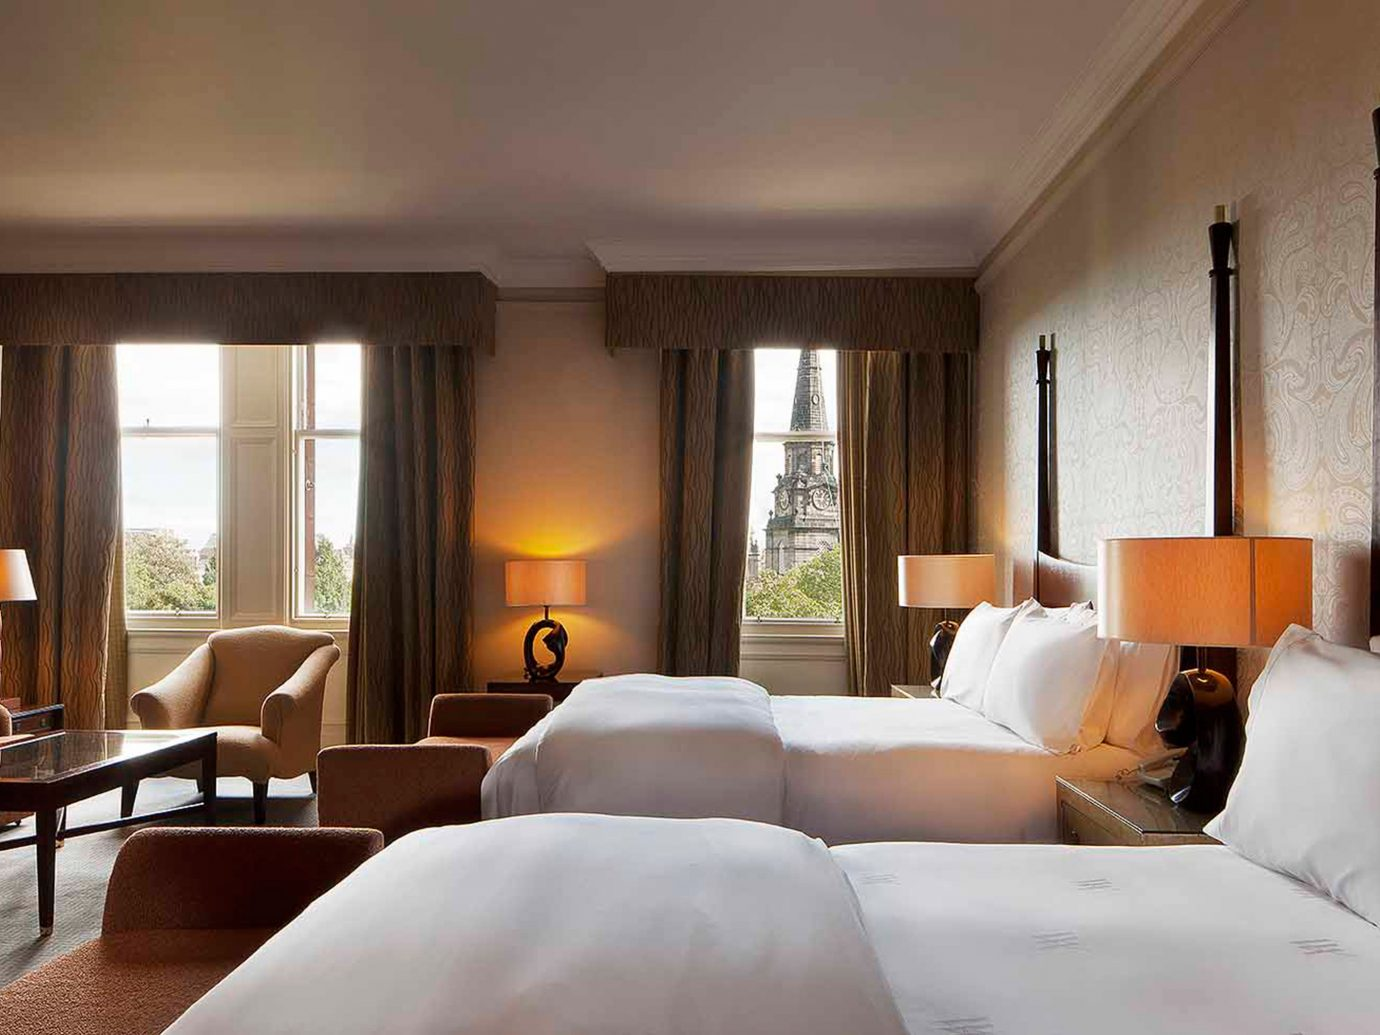 Bedroom at Waldorf Astoria Caledonian